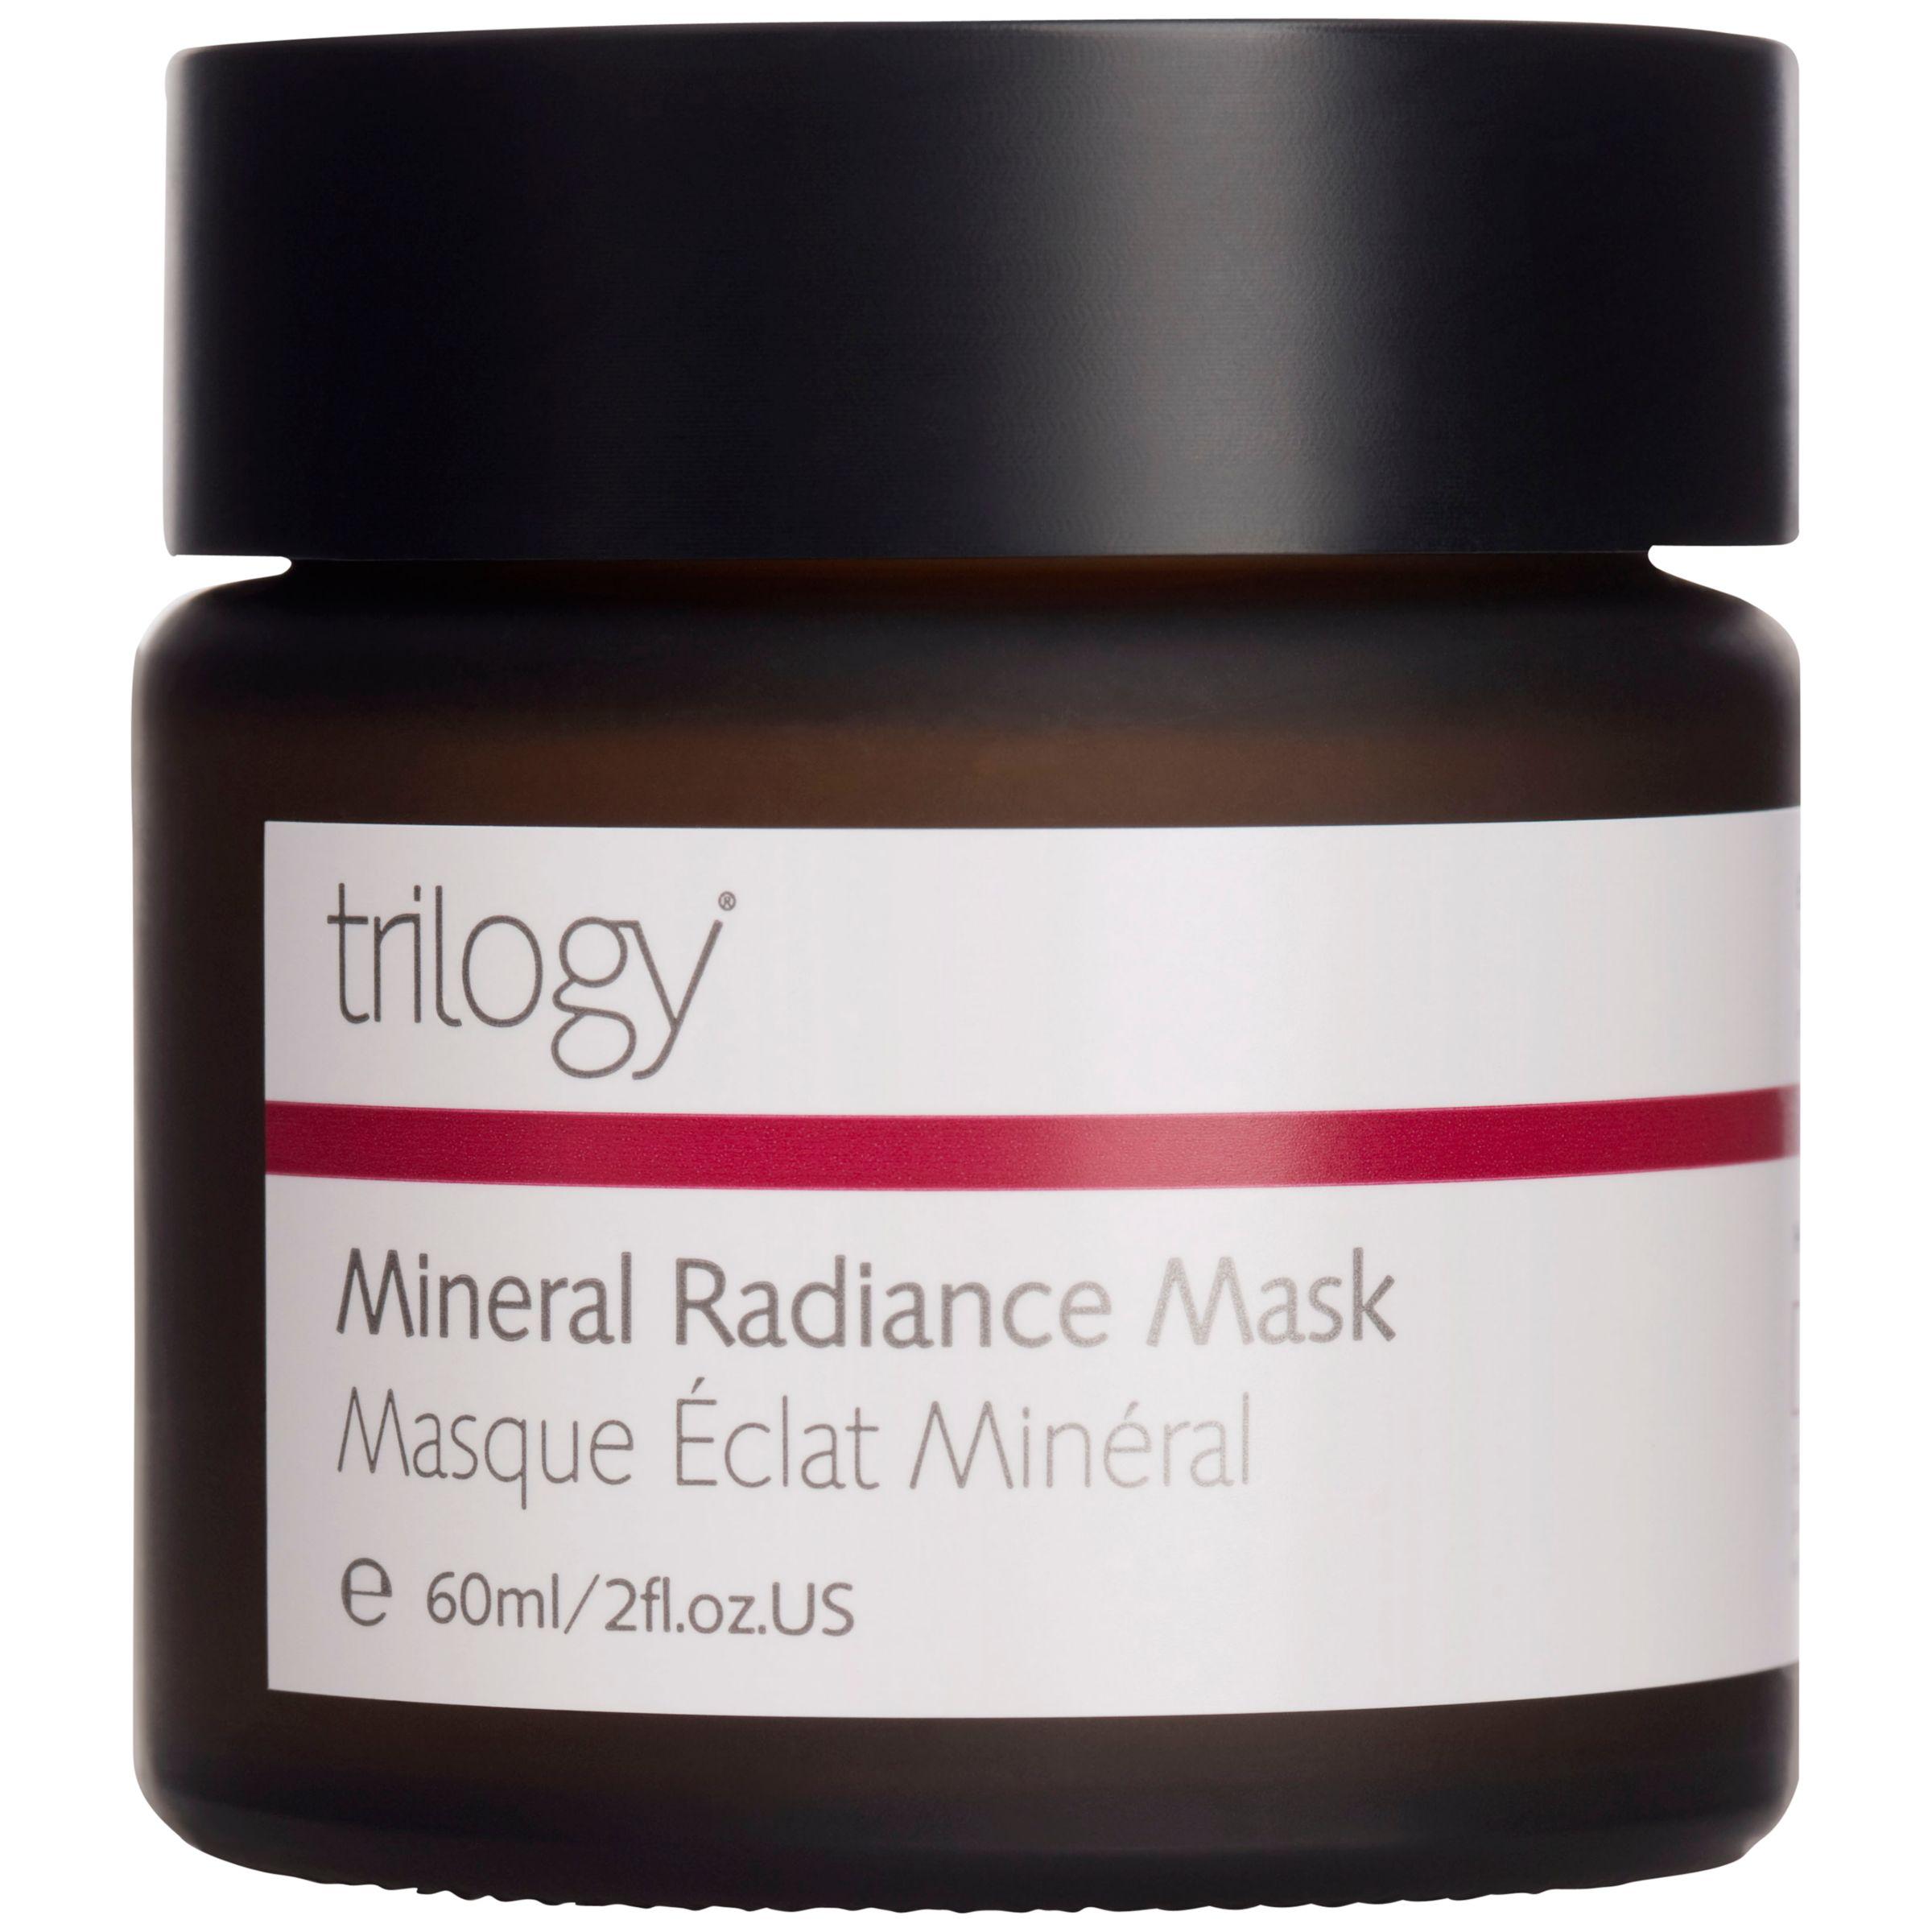 Trilogy Trilogy Mineral Radiance Mask, 60ml